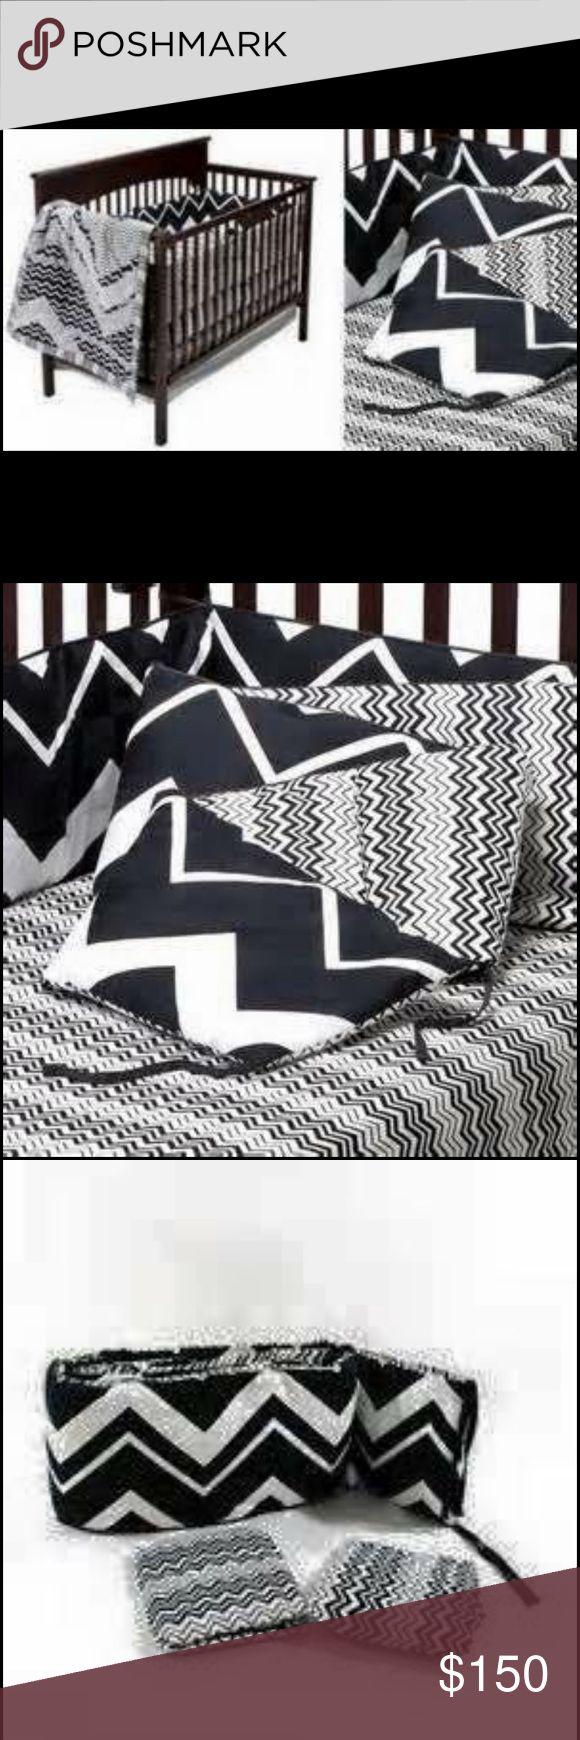 Missoni for target chevron crib bumper bedding So fun. Missoni for target black and white chevron crib bumper and sheet set Missoni Other